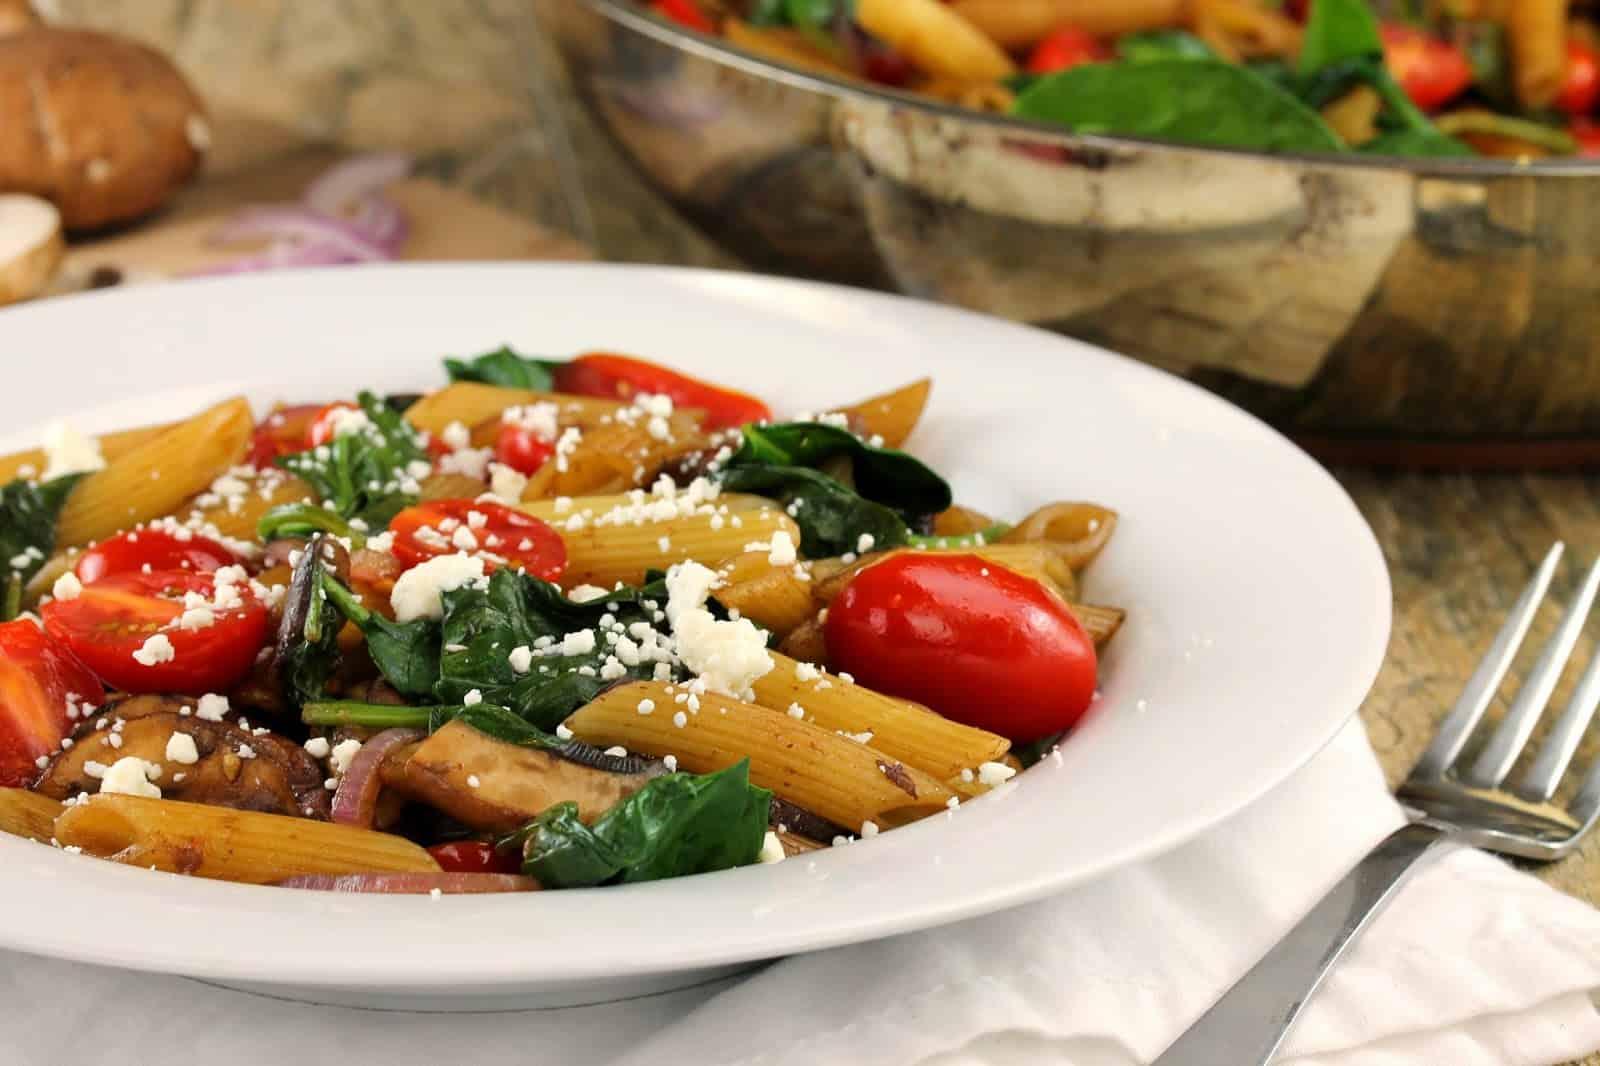 Pasta fresca in a white bowl.